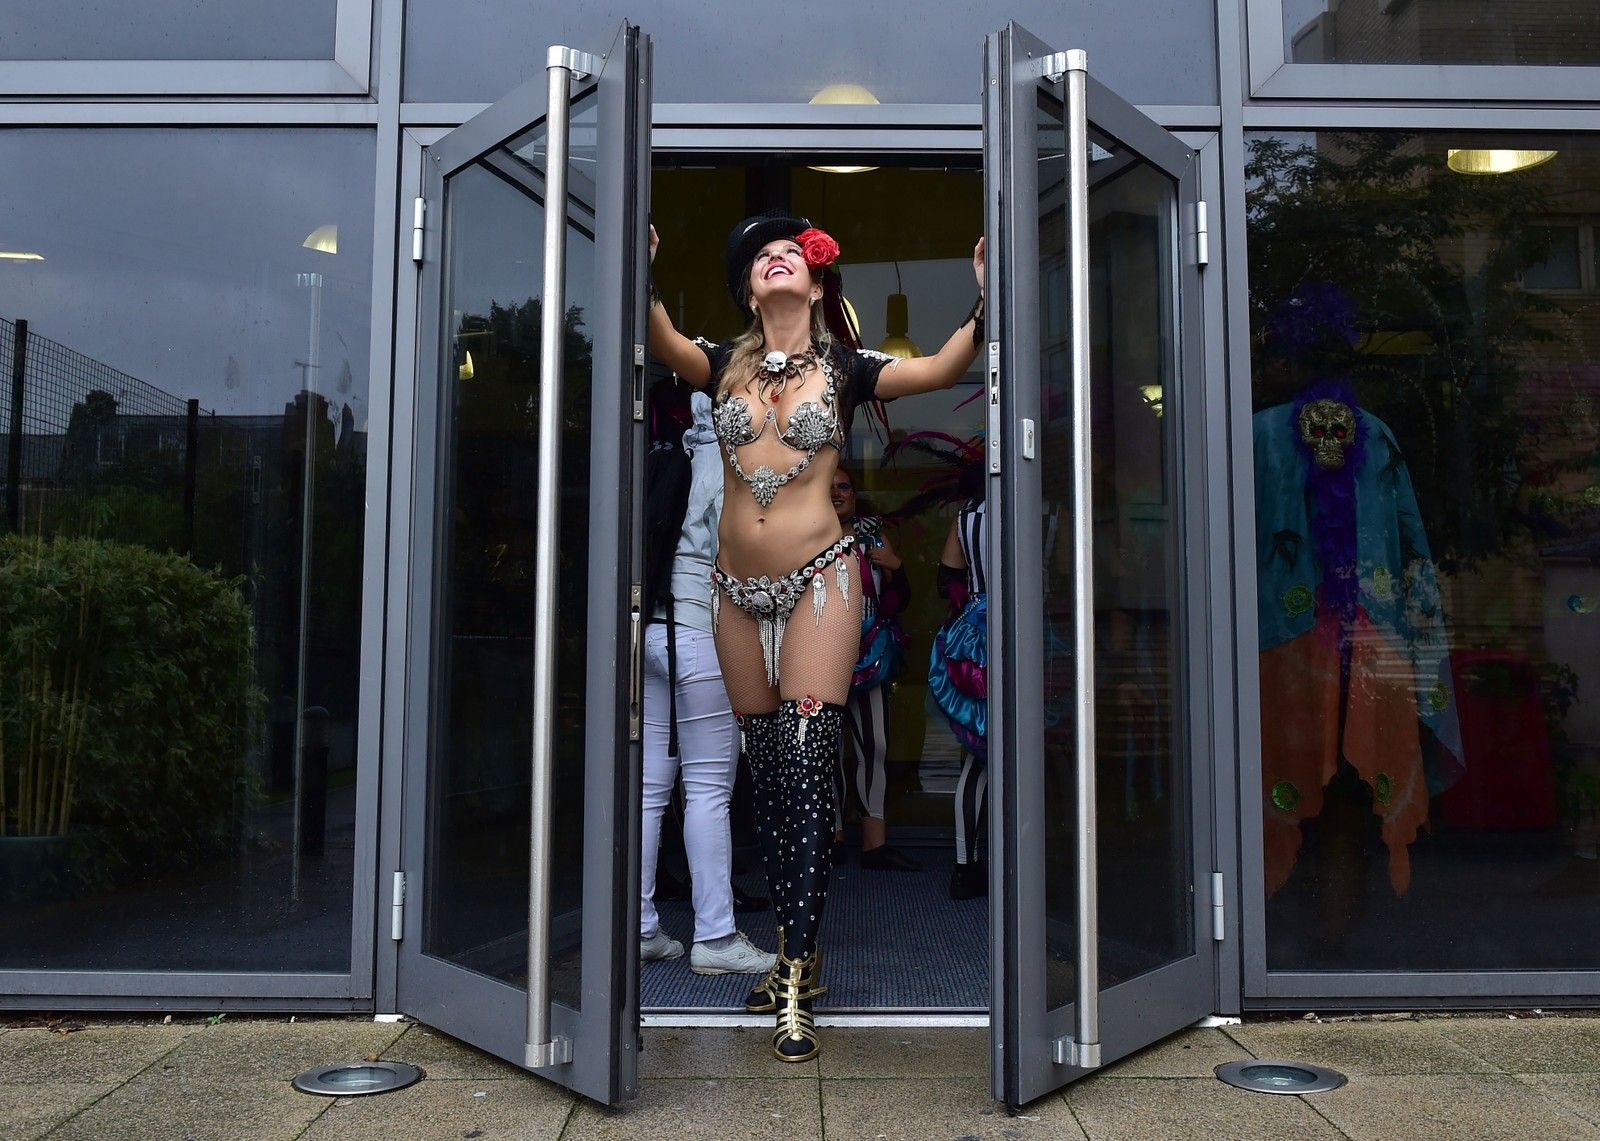 Sambaskolen i London deltok i det årlige Notting Hill-karnevalet. Regn trua imidlertid arrangementet, som første gang fant sted på 60-tallet.